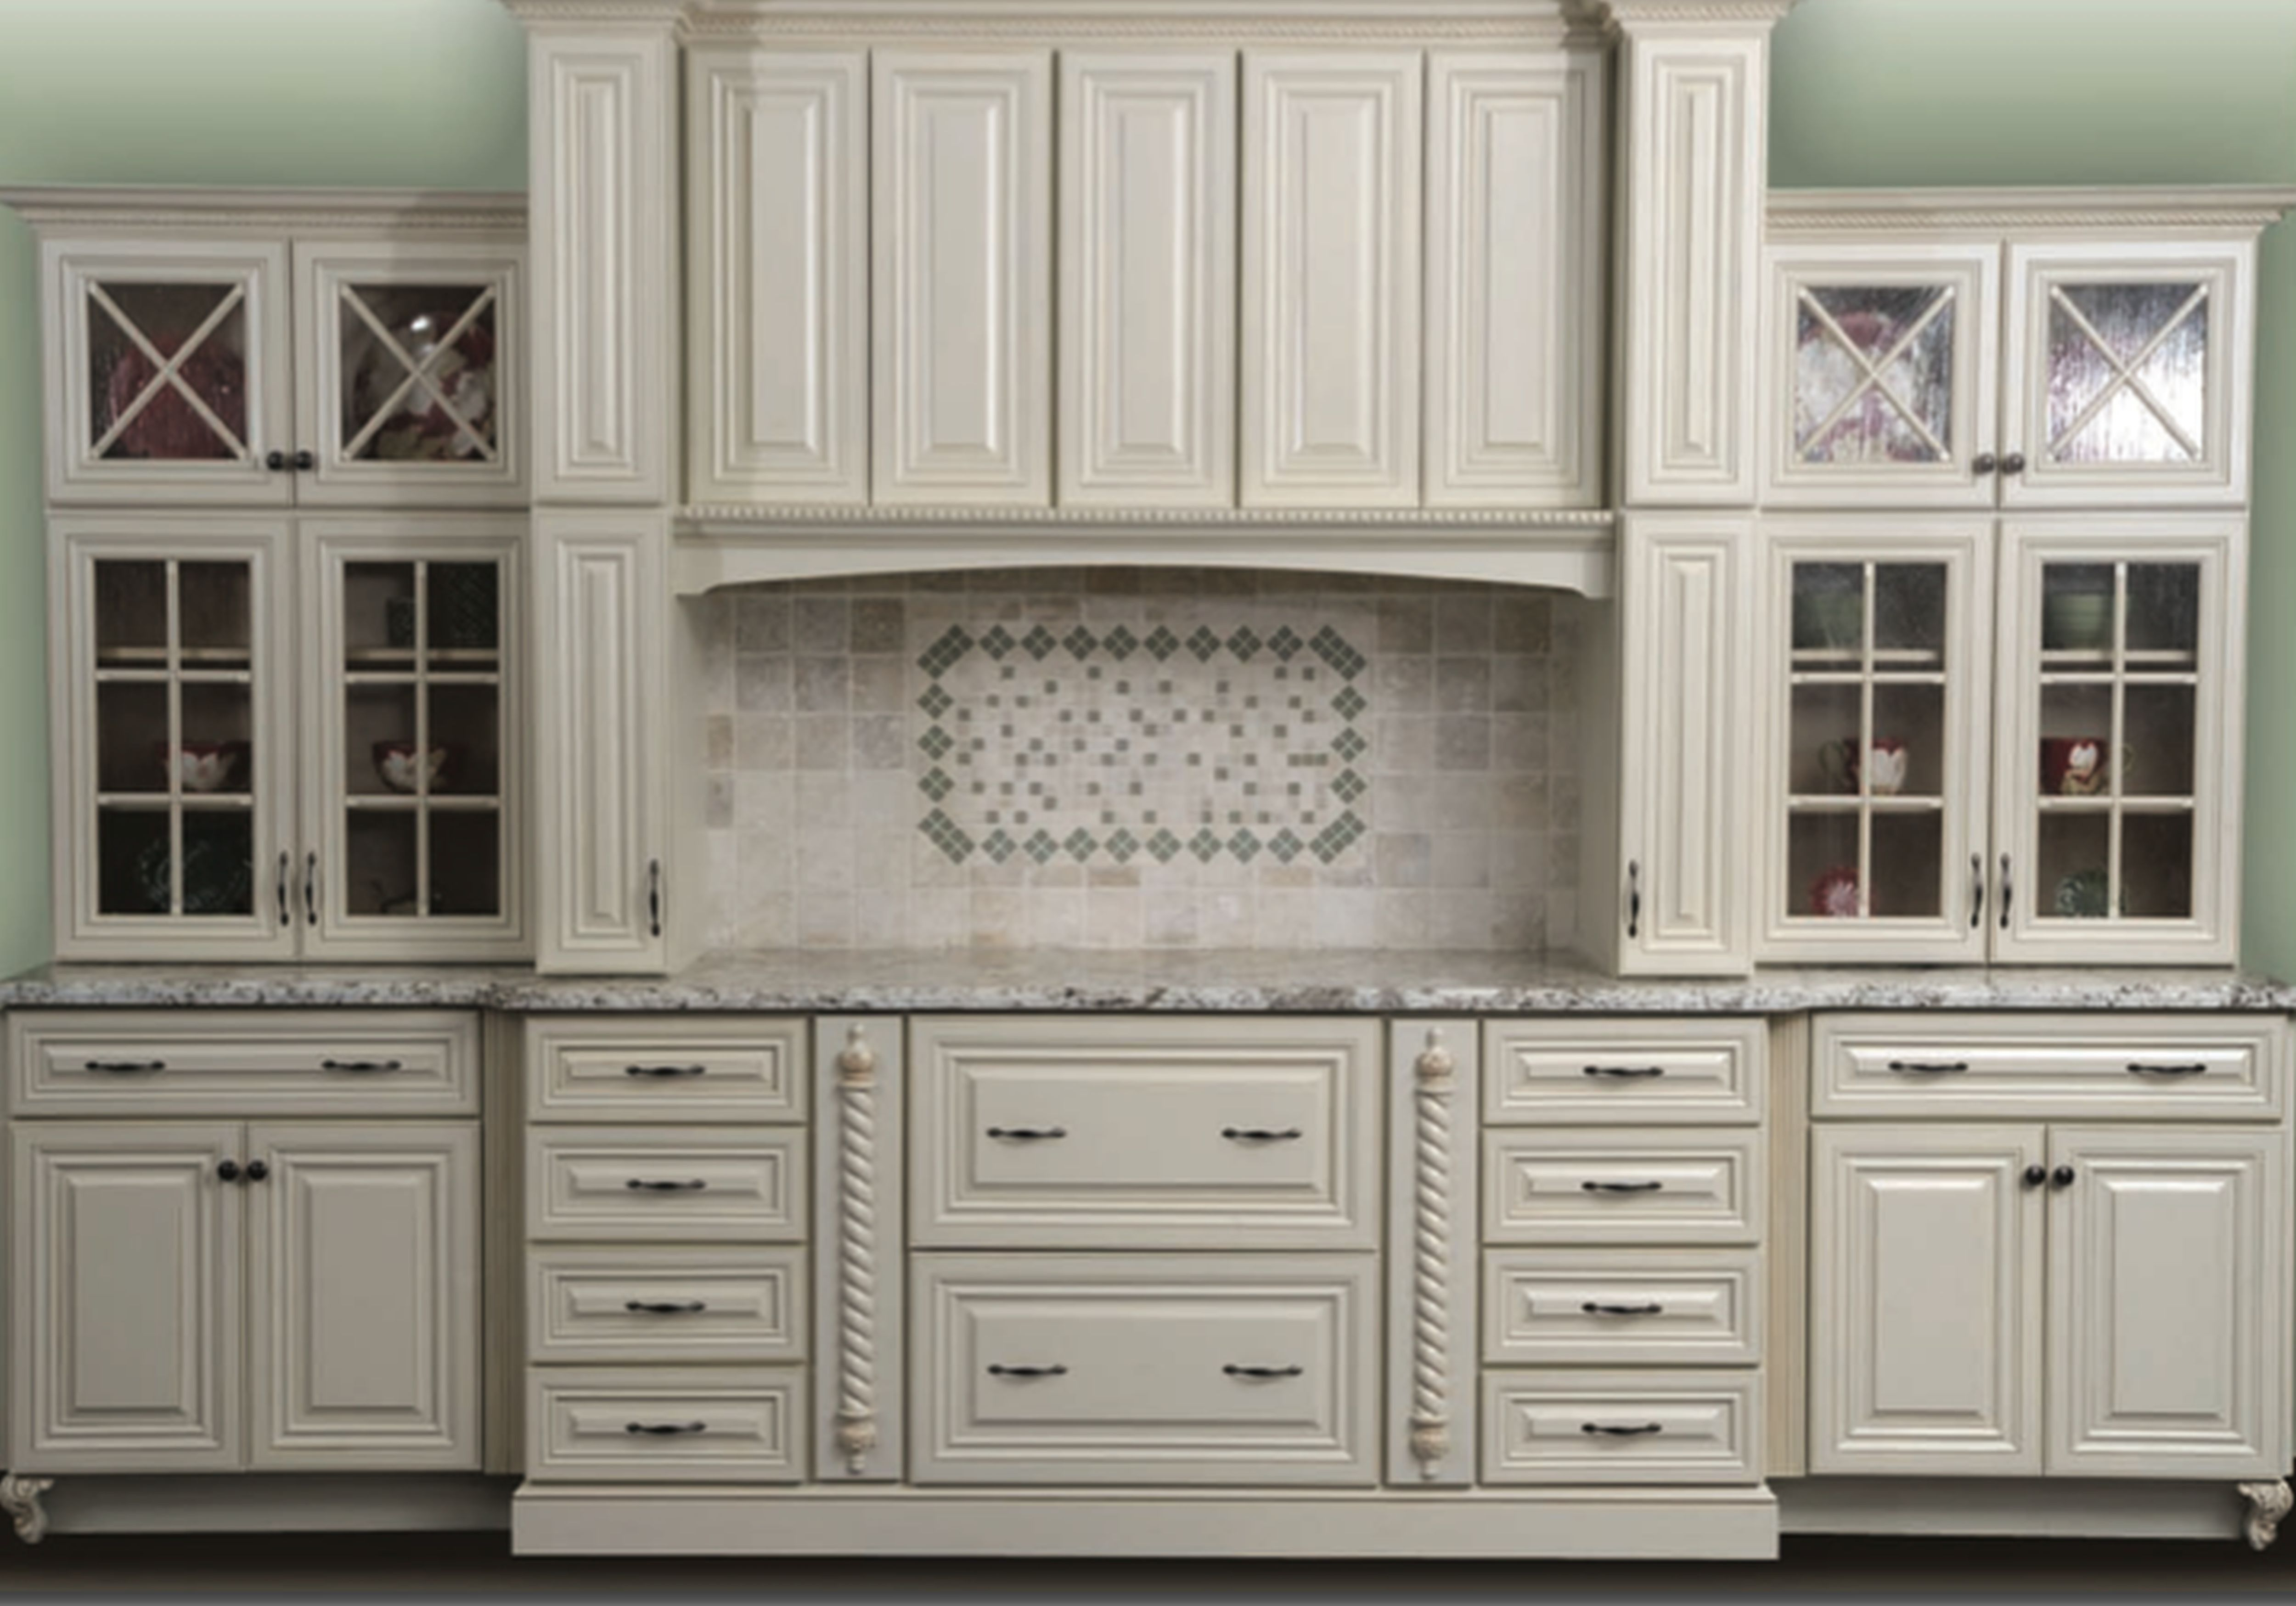 North American Maple Antique White Glaze Kitchen Cabinets With Glass Doors Antique Kitchen Cabinets Antique White Kitchen Kitchen Cabinet Trends